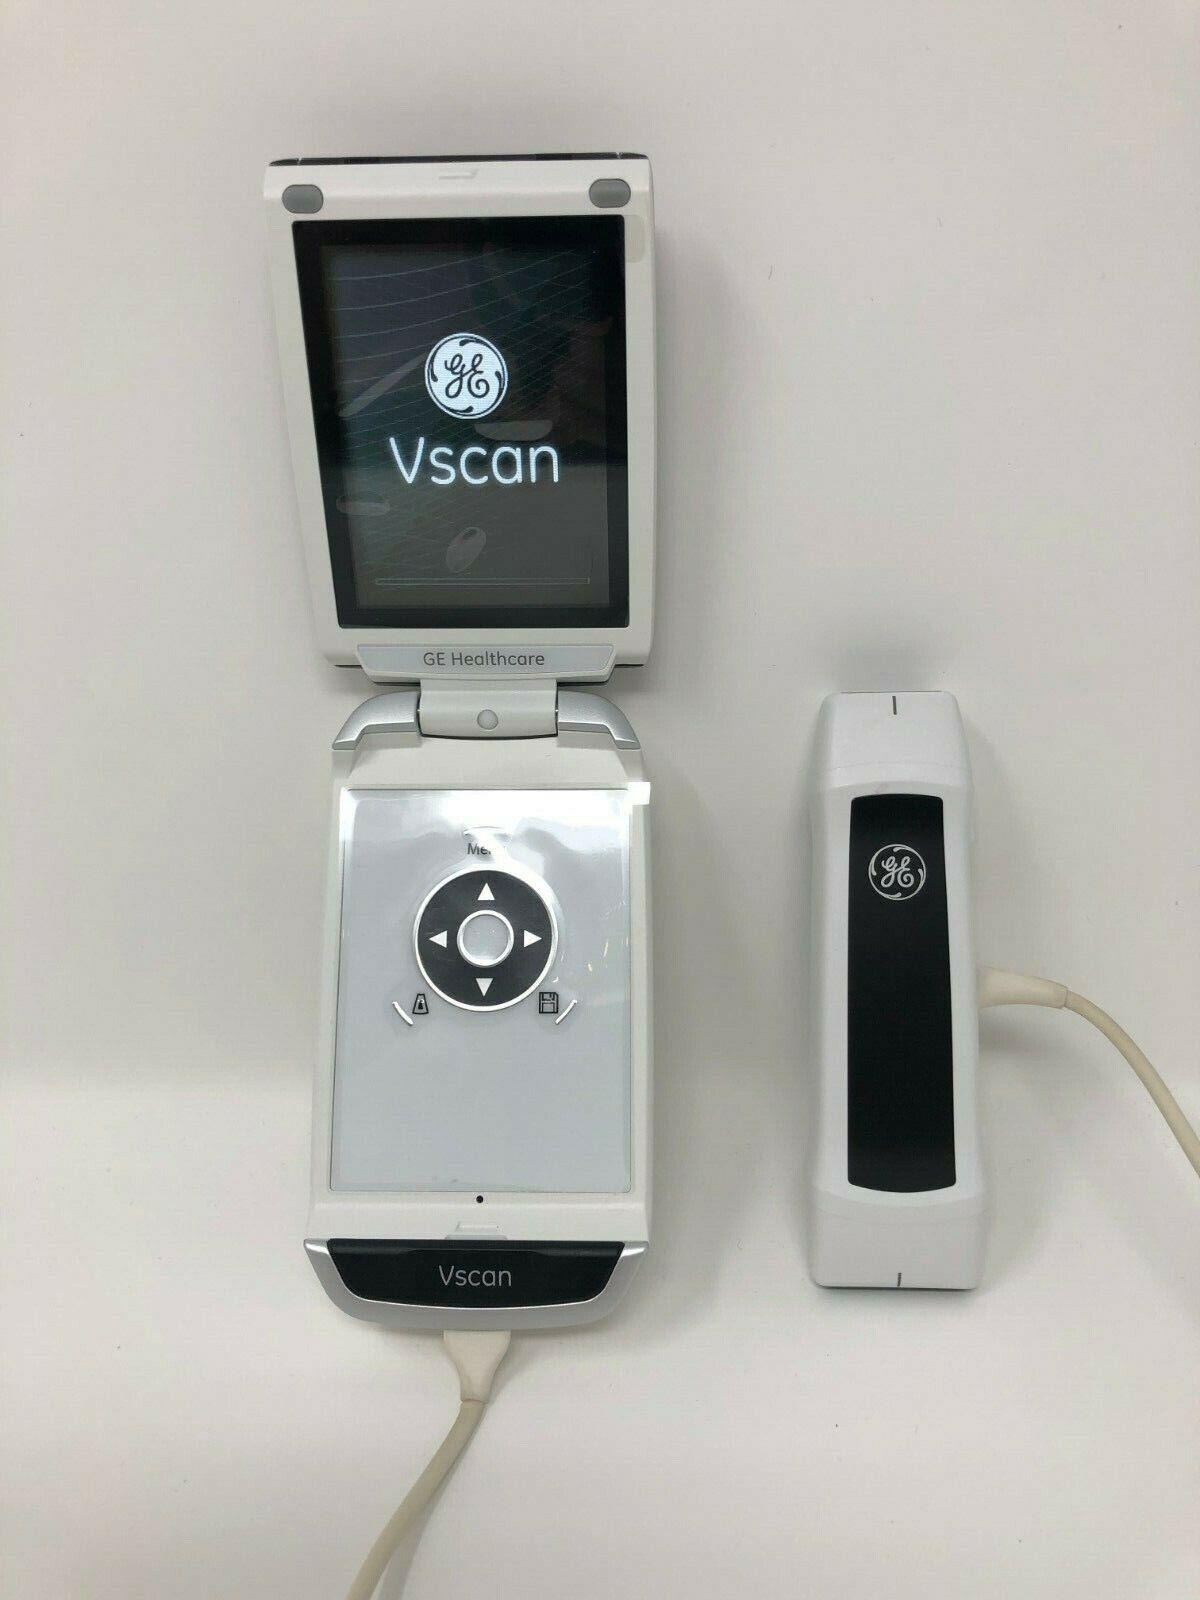 Best NEW – OPEN BOX GE VSCAN PORTABLE ULTRASOUND MACHINE